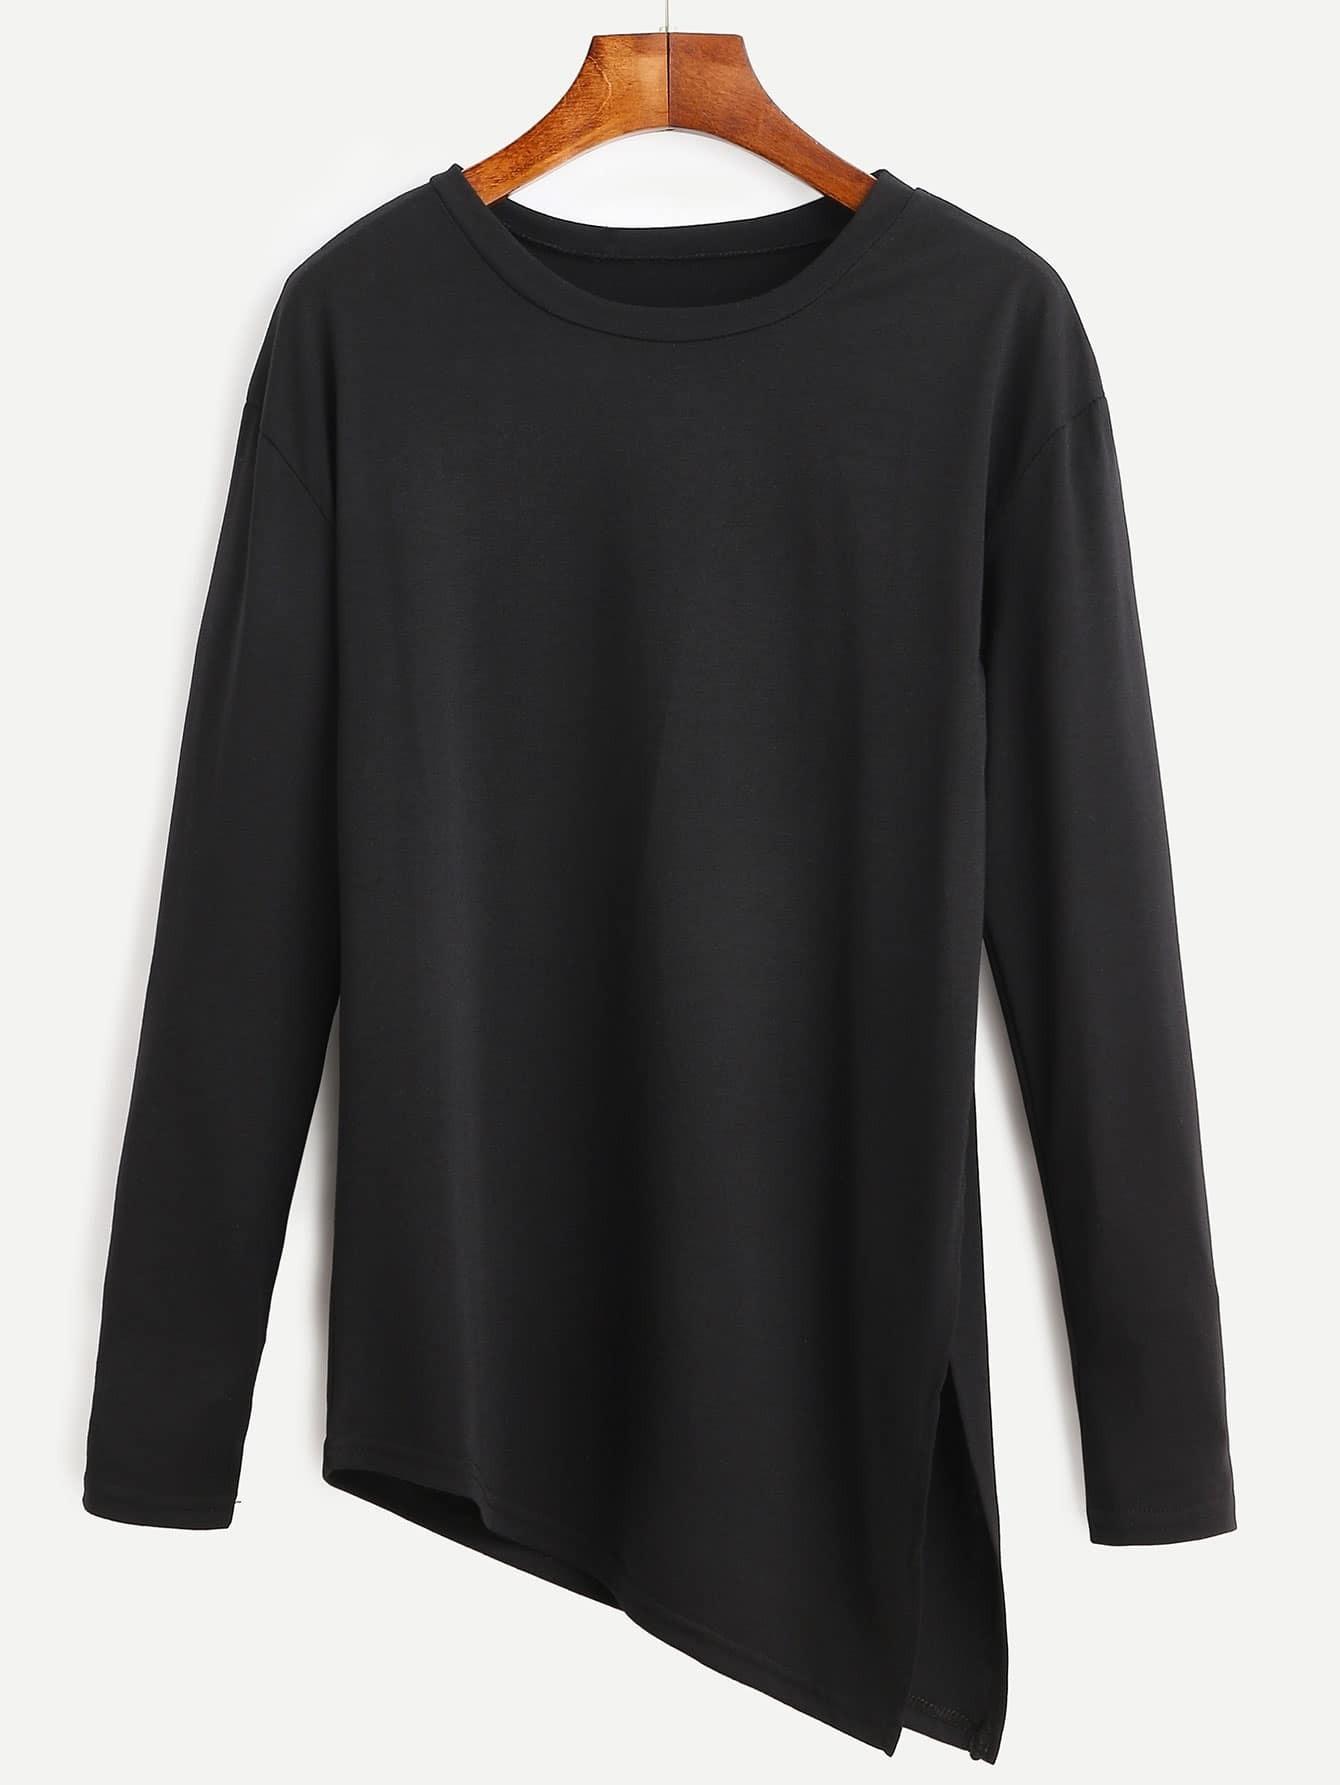 Black Asymmetrical Slit Side Long Sleeve T-shirt